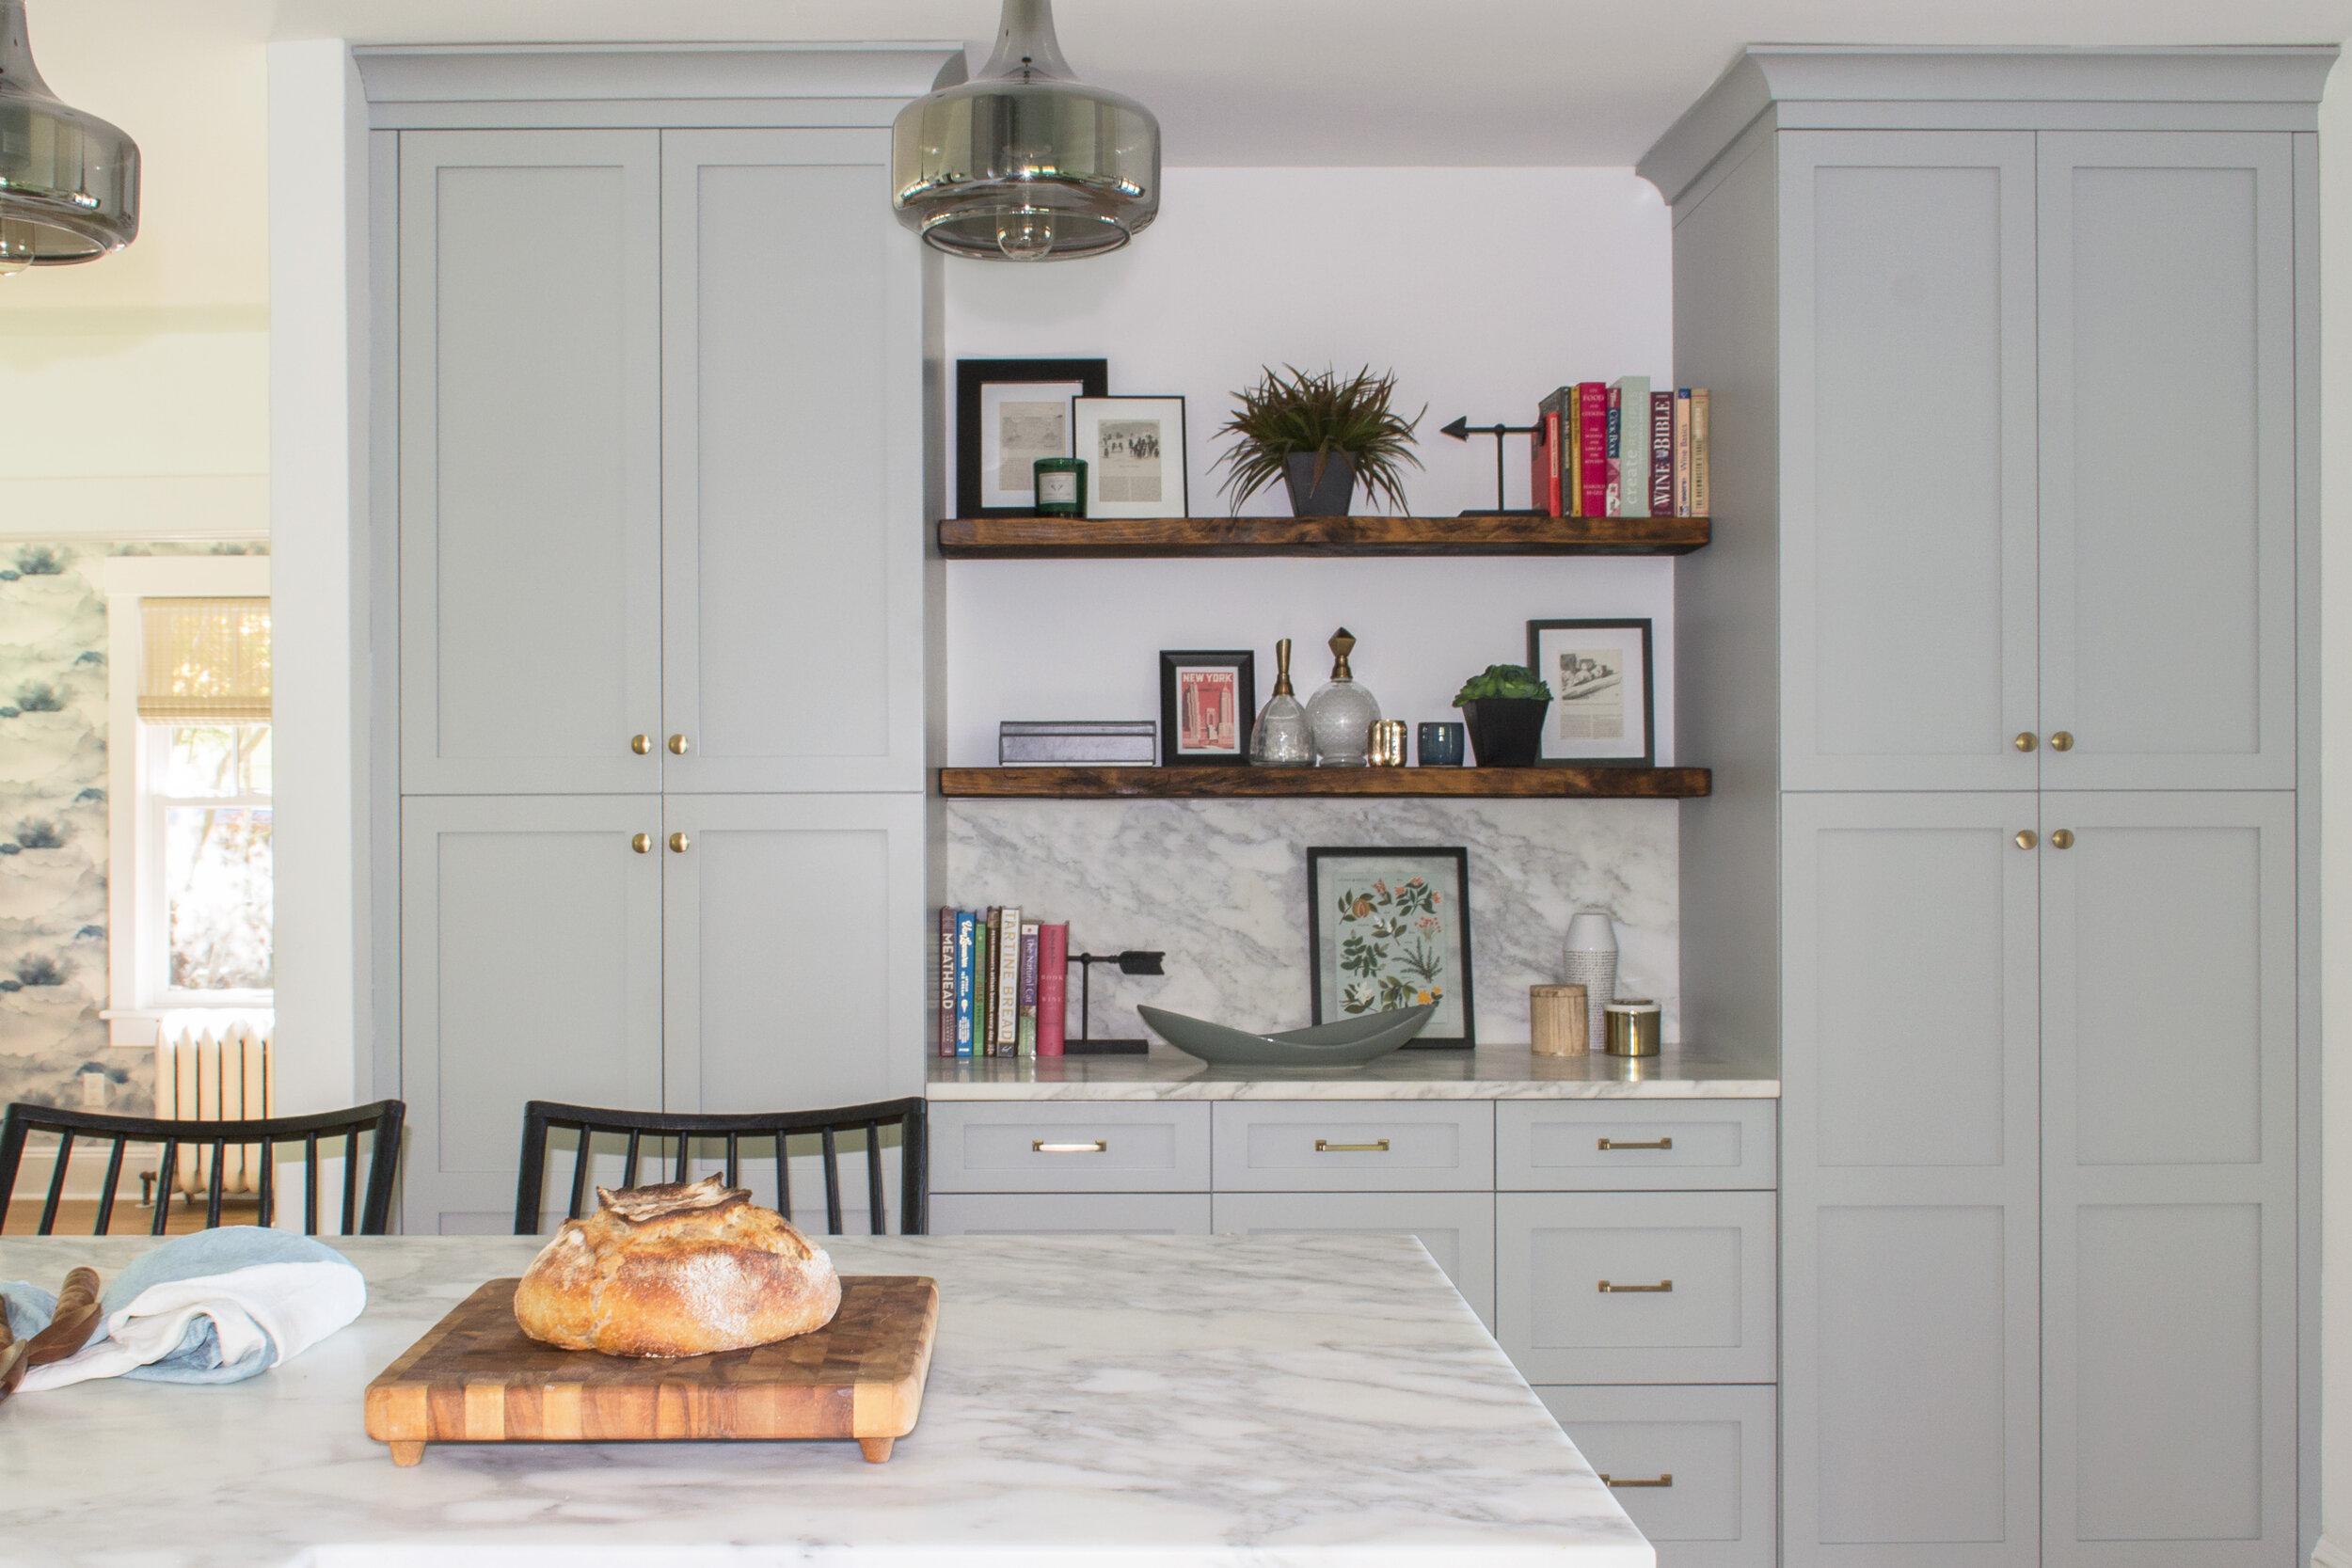 kitchen-gray-modern-tc-interiors-2.jpg